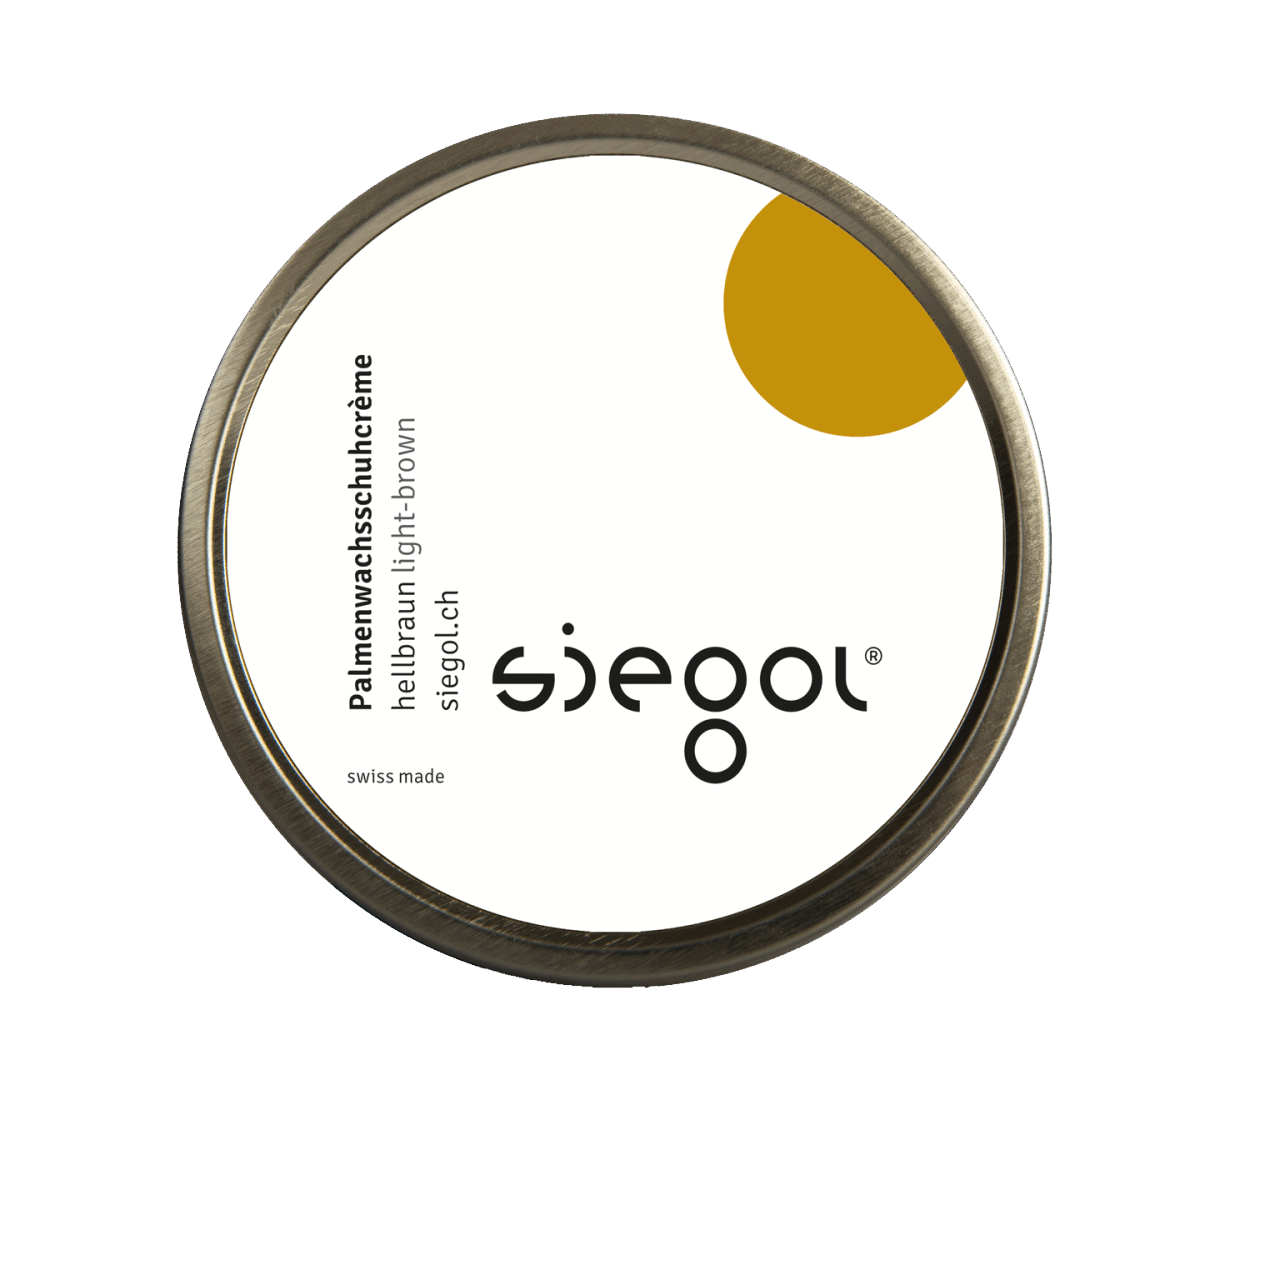 Siegol Palmenwax 100ml - light brown